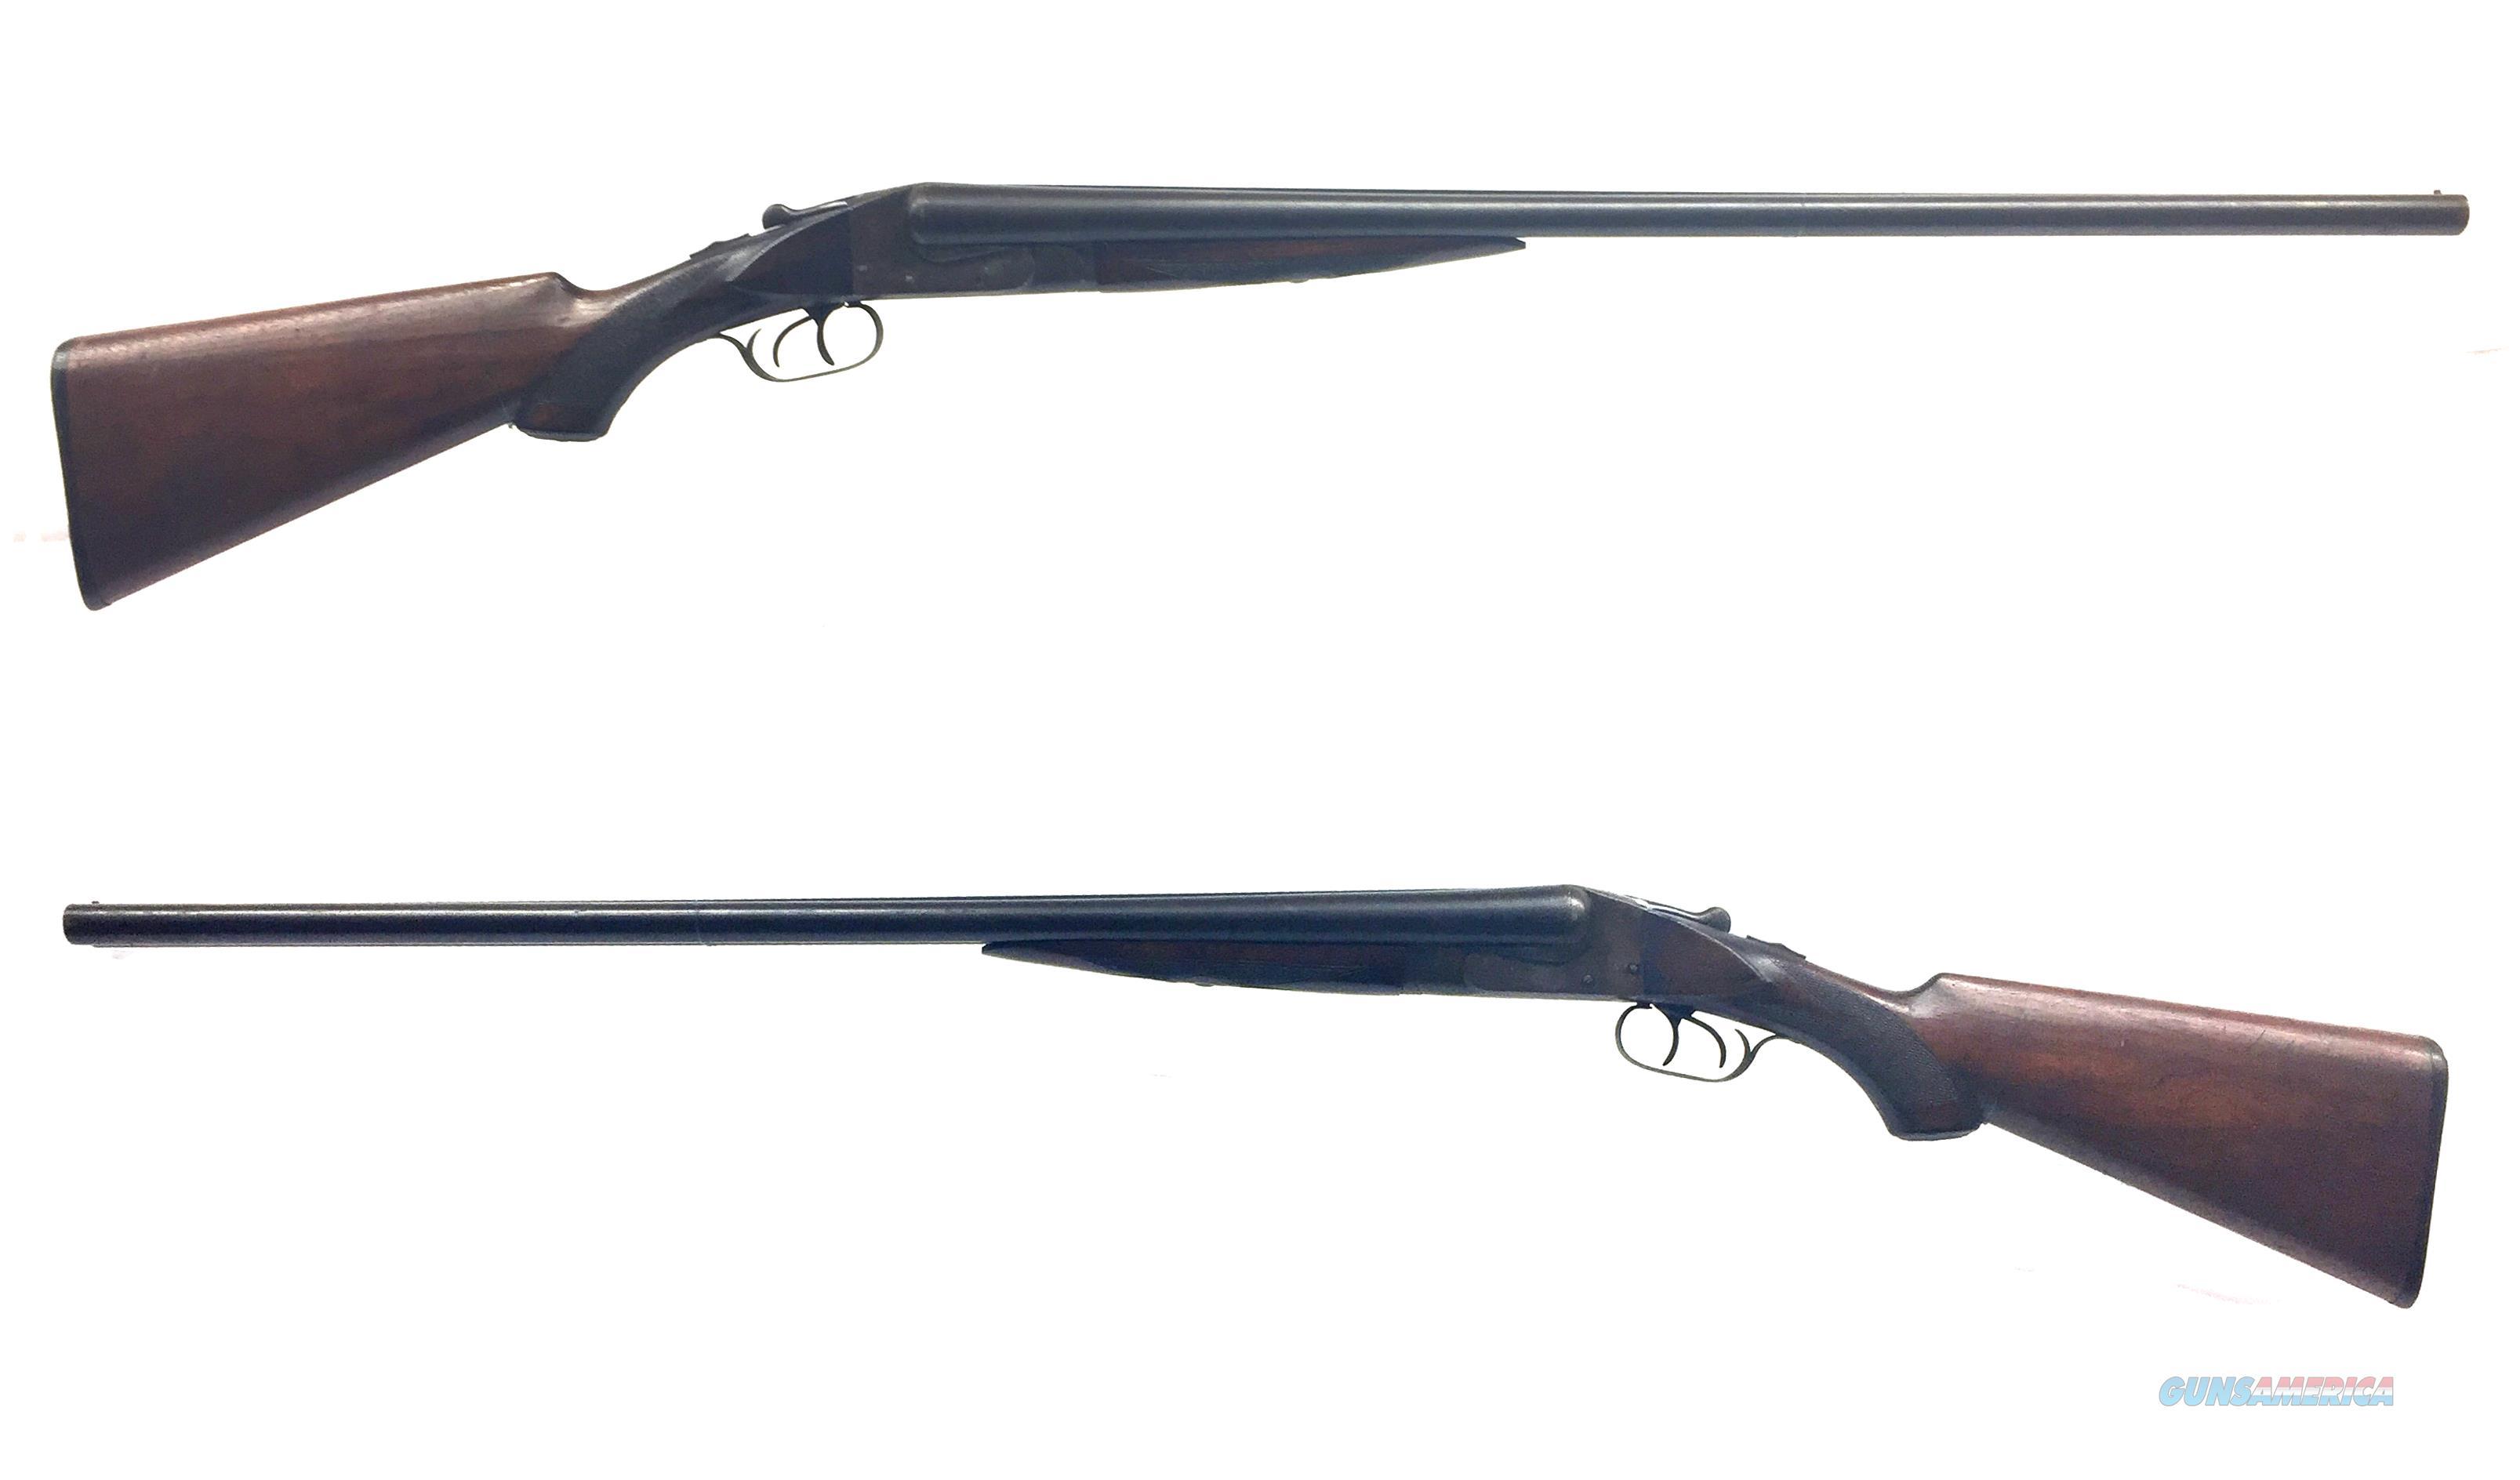 Ithaca Lewis Hammerless 12GA SxS Shotgun W/ Damascus Steel Barrels  Guns > Shotguns > Ithaca Shotguns > SxS